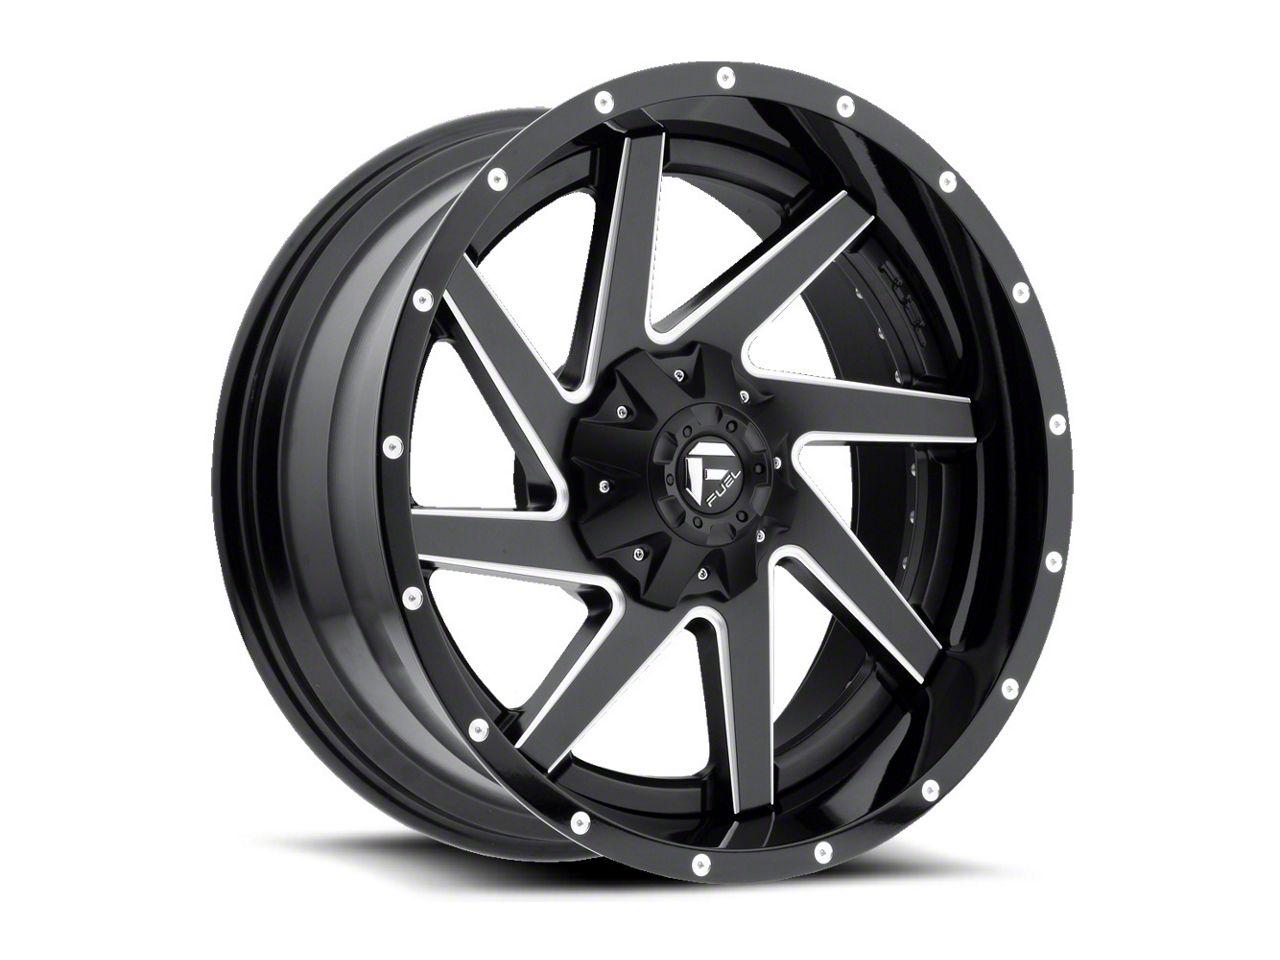 Fuel Wheels Renegade Black Milled 6-Lug Wheel - 20x14 (99-18 Silverado 1500)